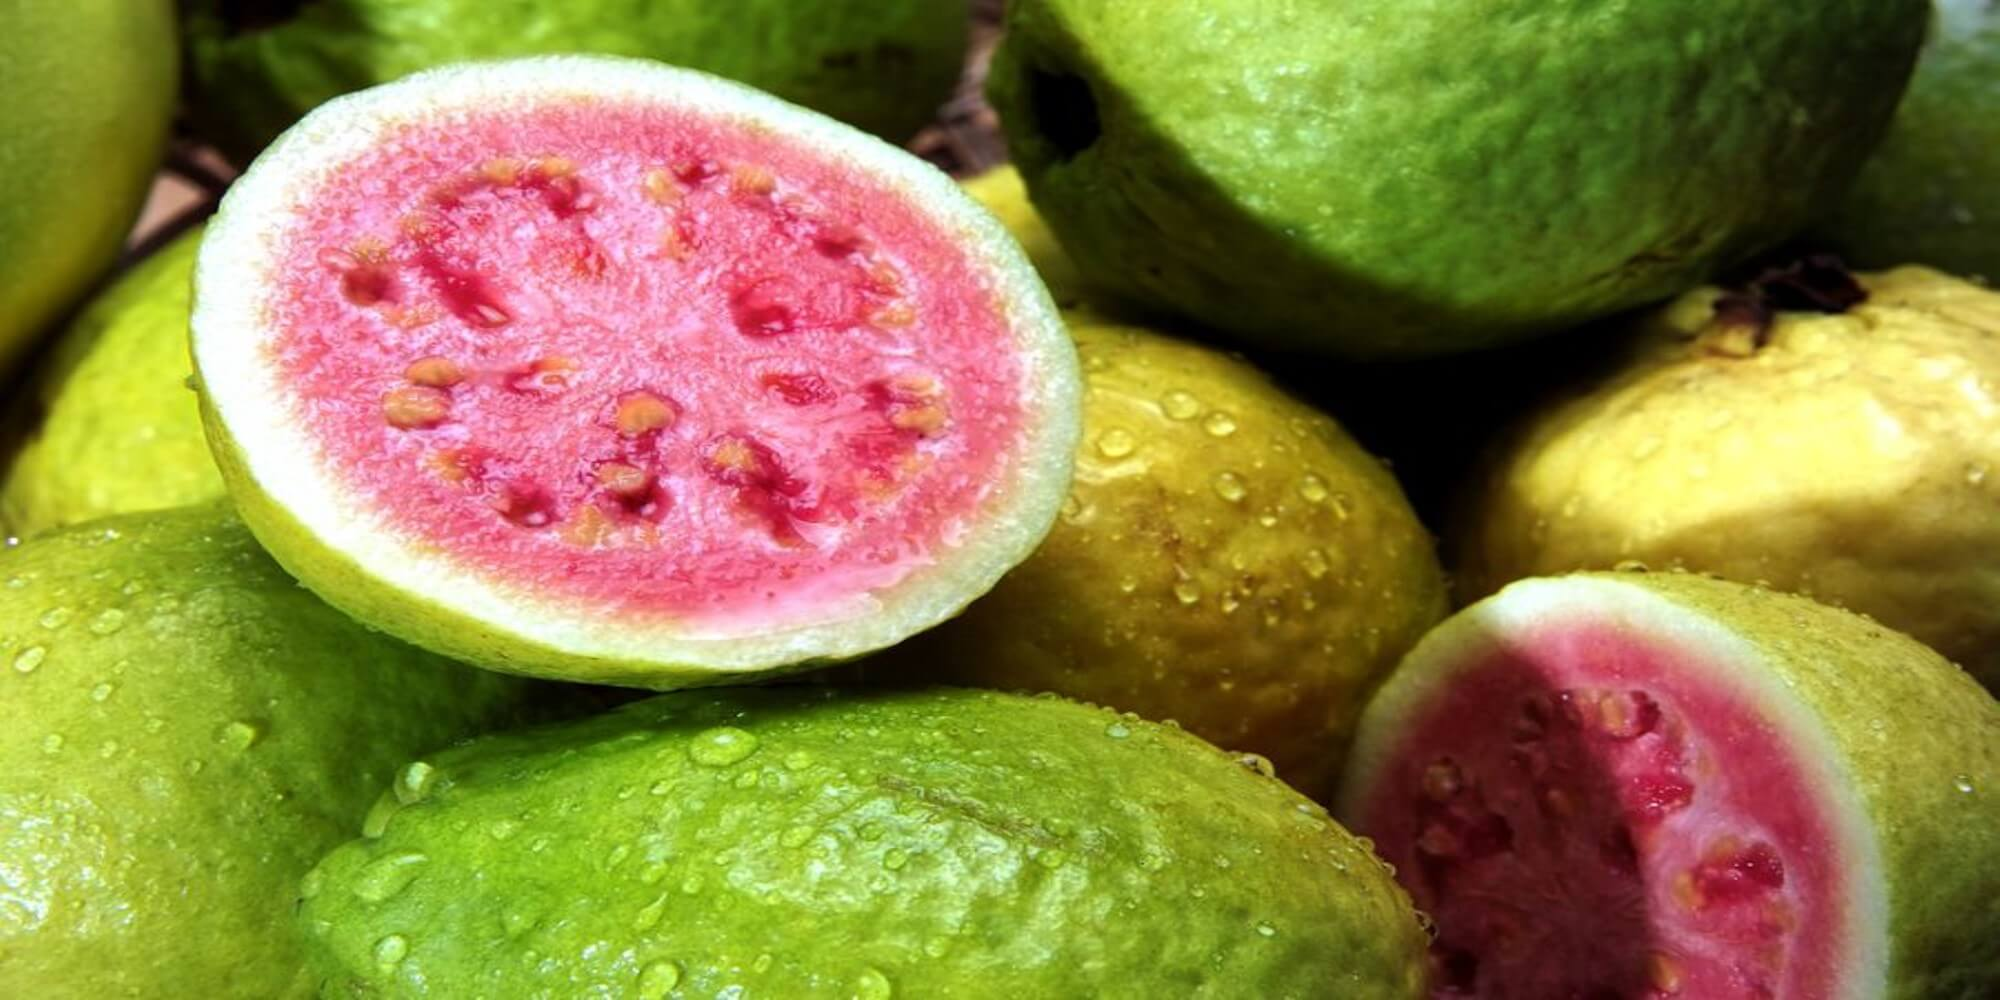 allahabadi surkha guava image